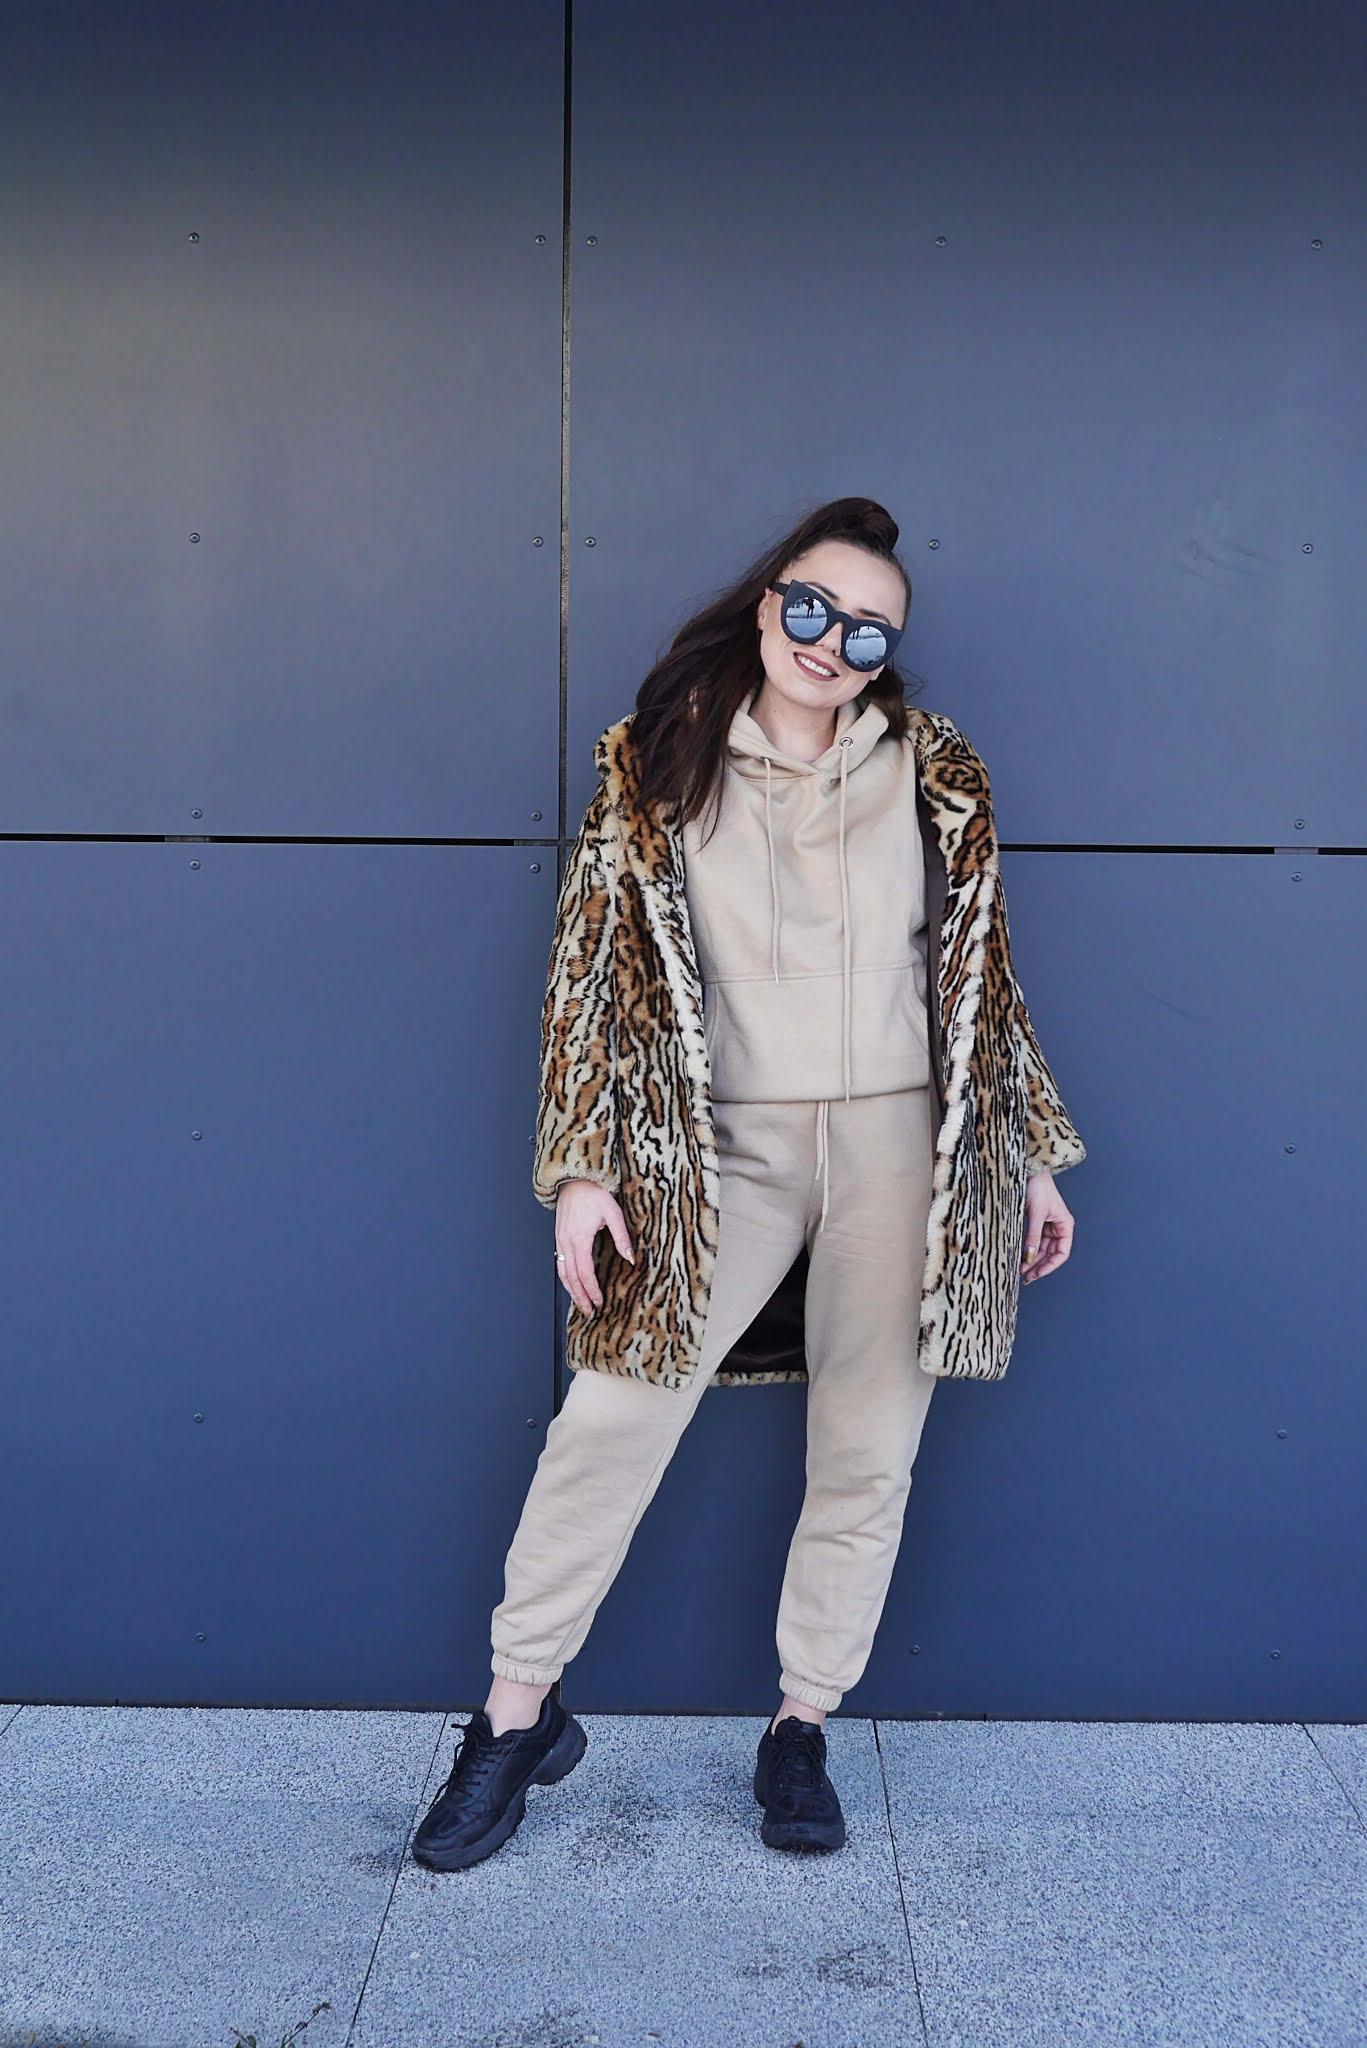 blog modowy blogerka modowa puławy karyn beżowy komplet dresowy dres femme luxe futerko w panterkę sneakersy czarne okulary koty